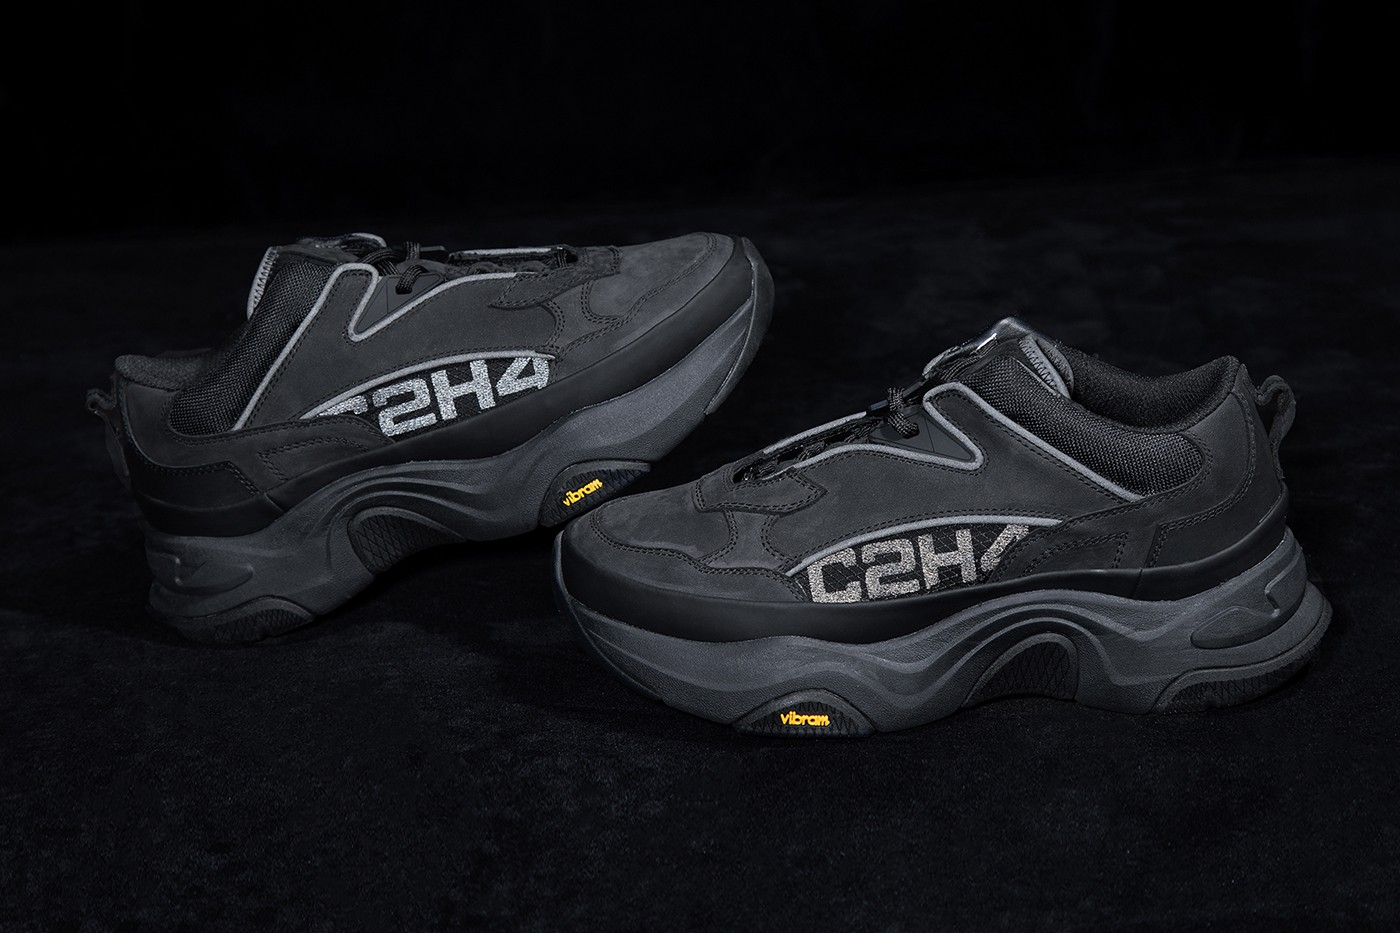 https___hypebeast.com_image_2020_11_c2h4-footwear-atom-alpha-quark-alpha-release-info-001